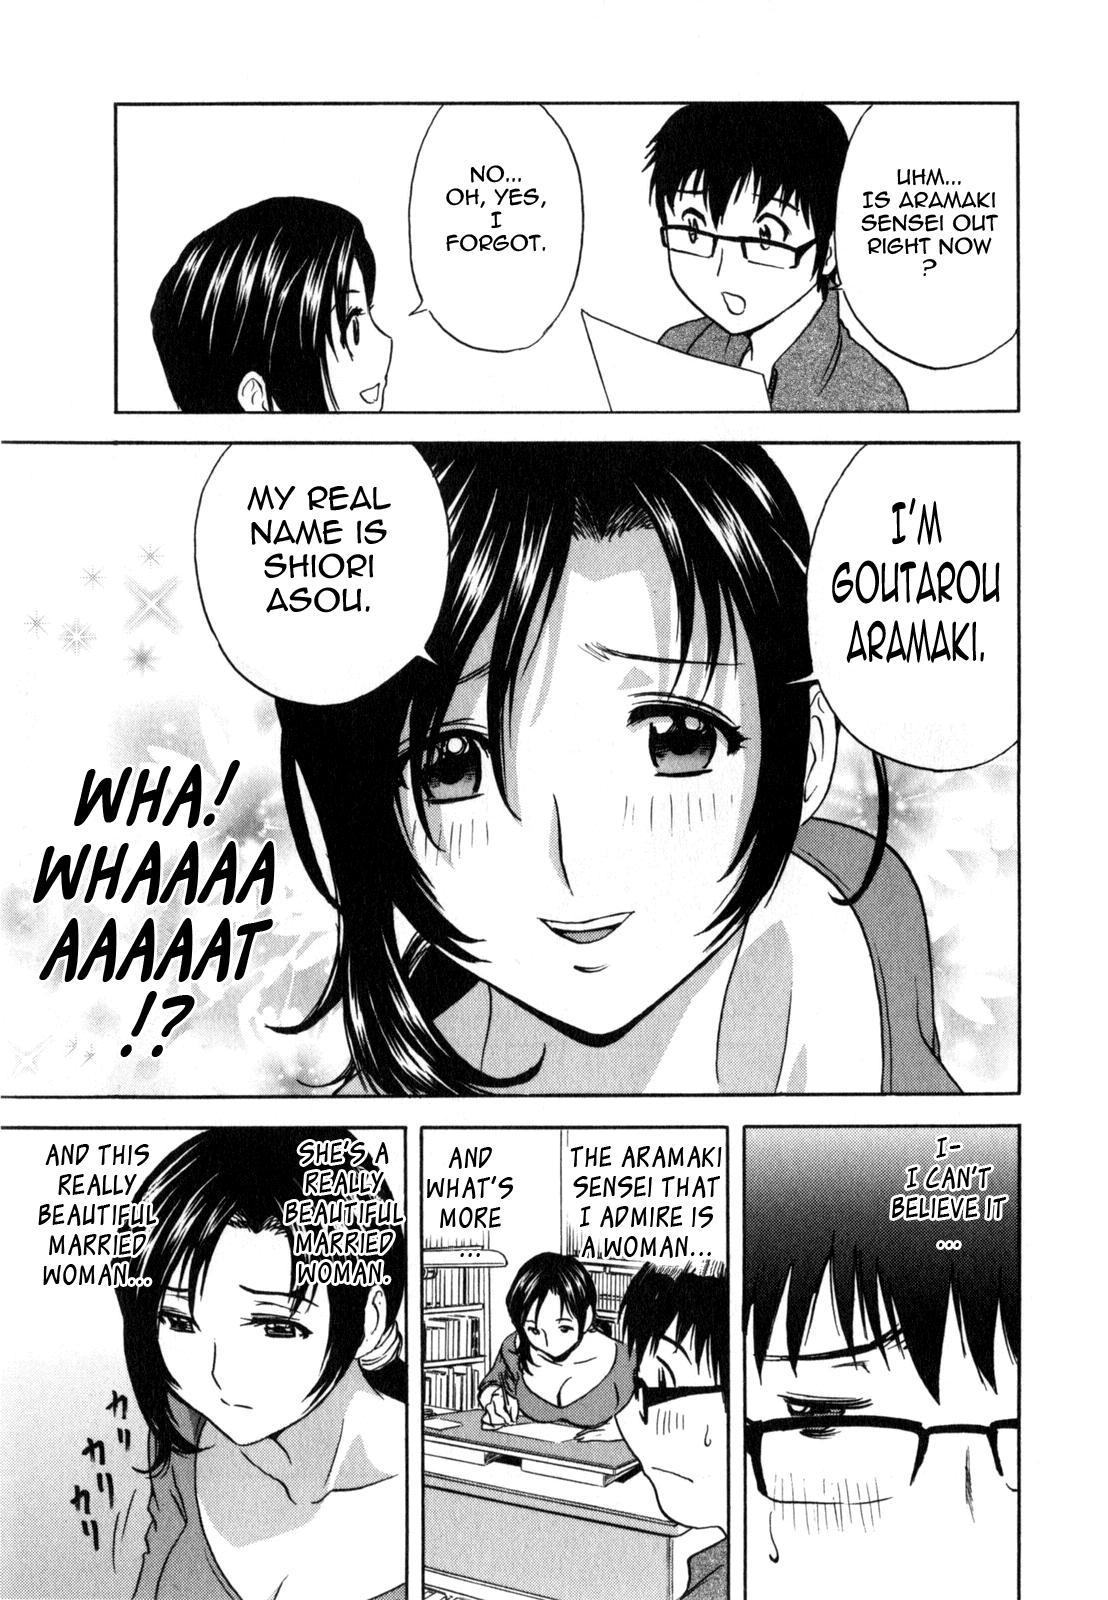 [Hidemaru] Life with Married Women Just Like a Manga 1 - Ch. 1-3 [English] {Tadanohito} 13